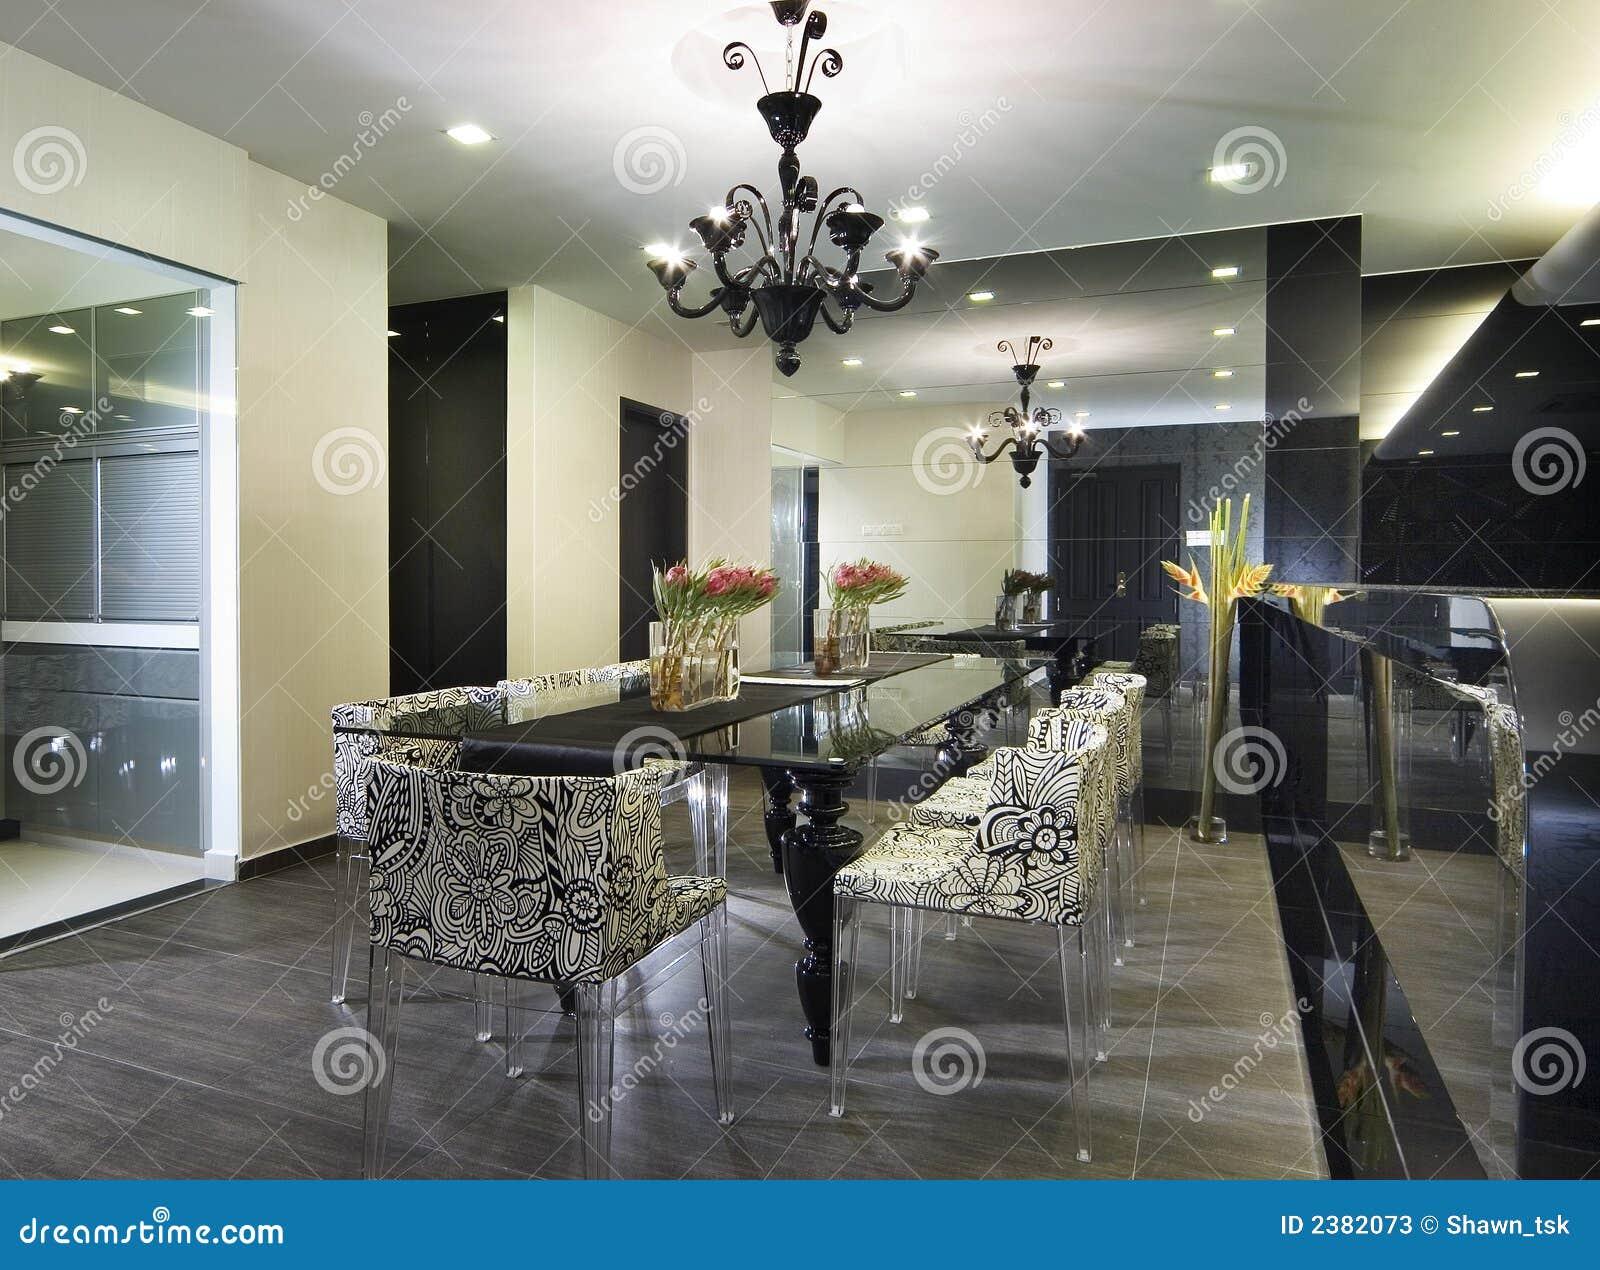 Interior design dining area stock photos image 2382073 for Interior decorators in my area